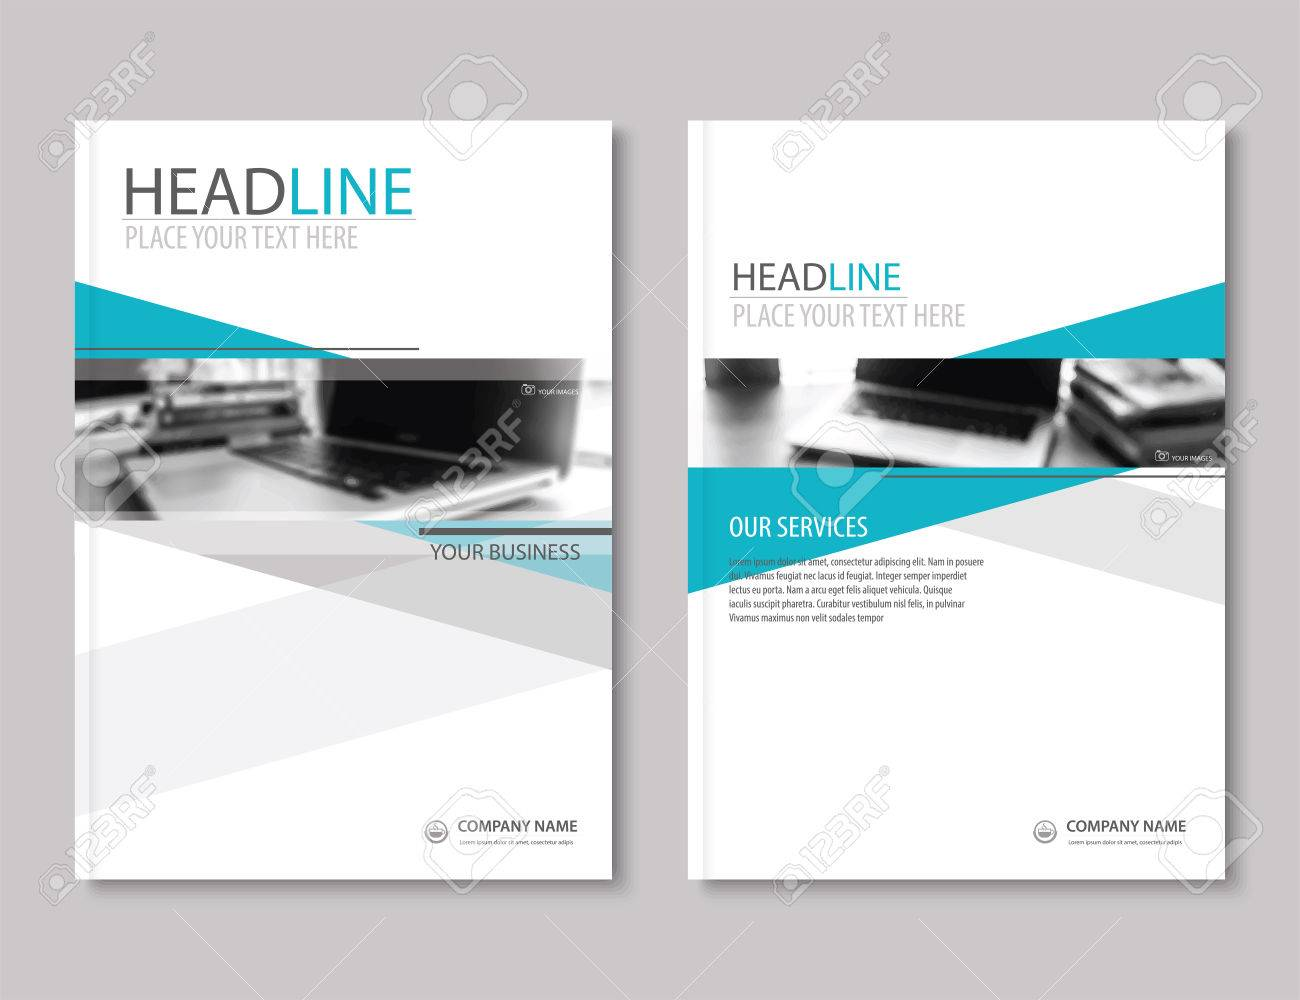 Annual report brochure flyer design template. Company profile business headline.Leaflet cover presentation flat background. - 62567484